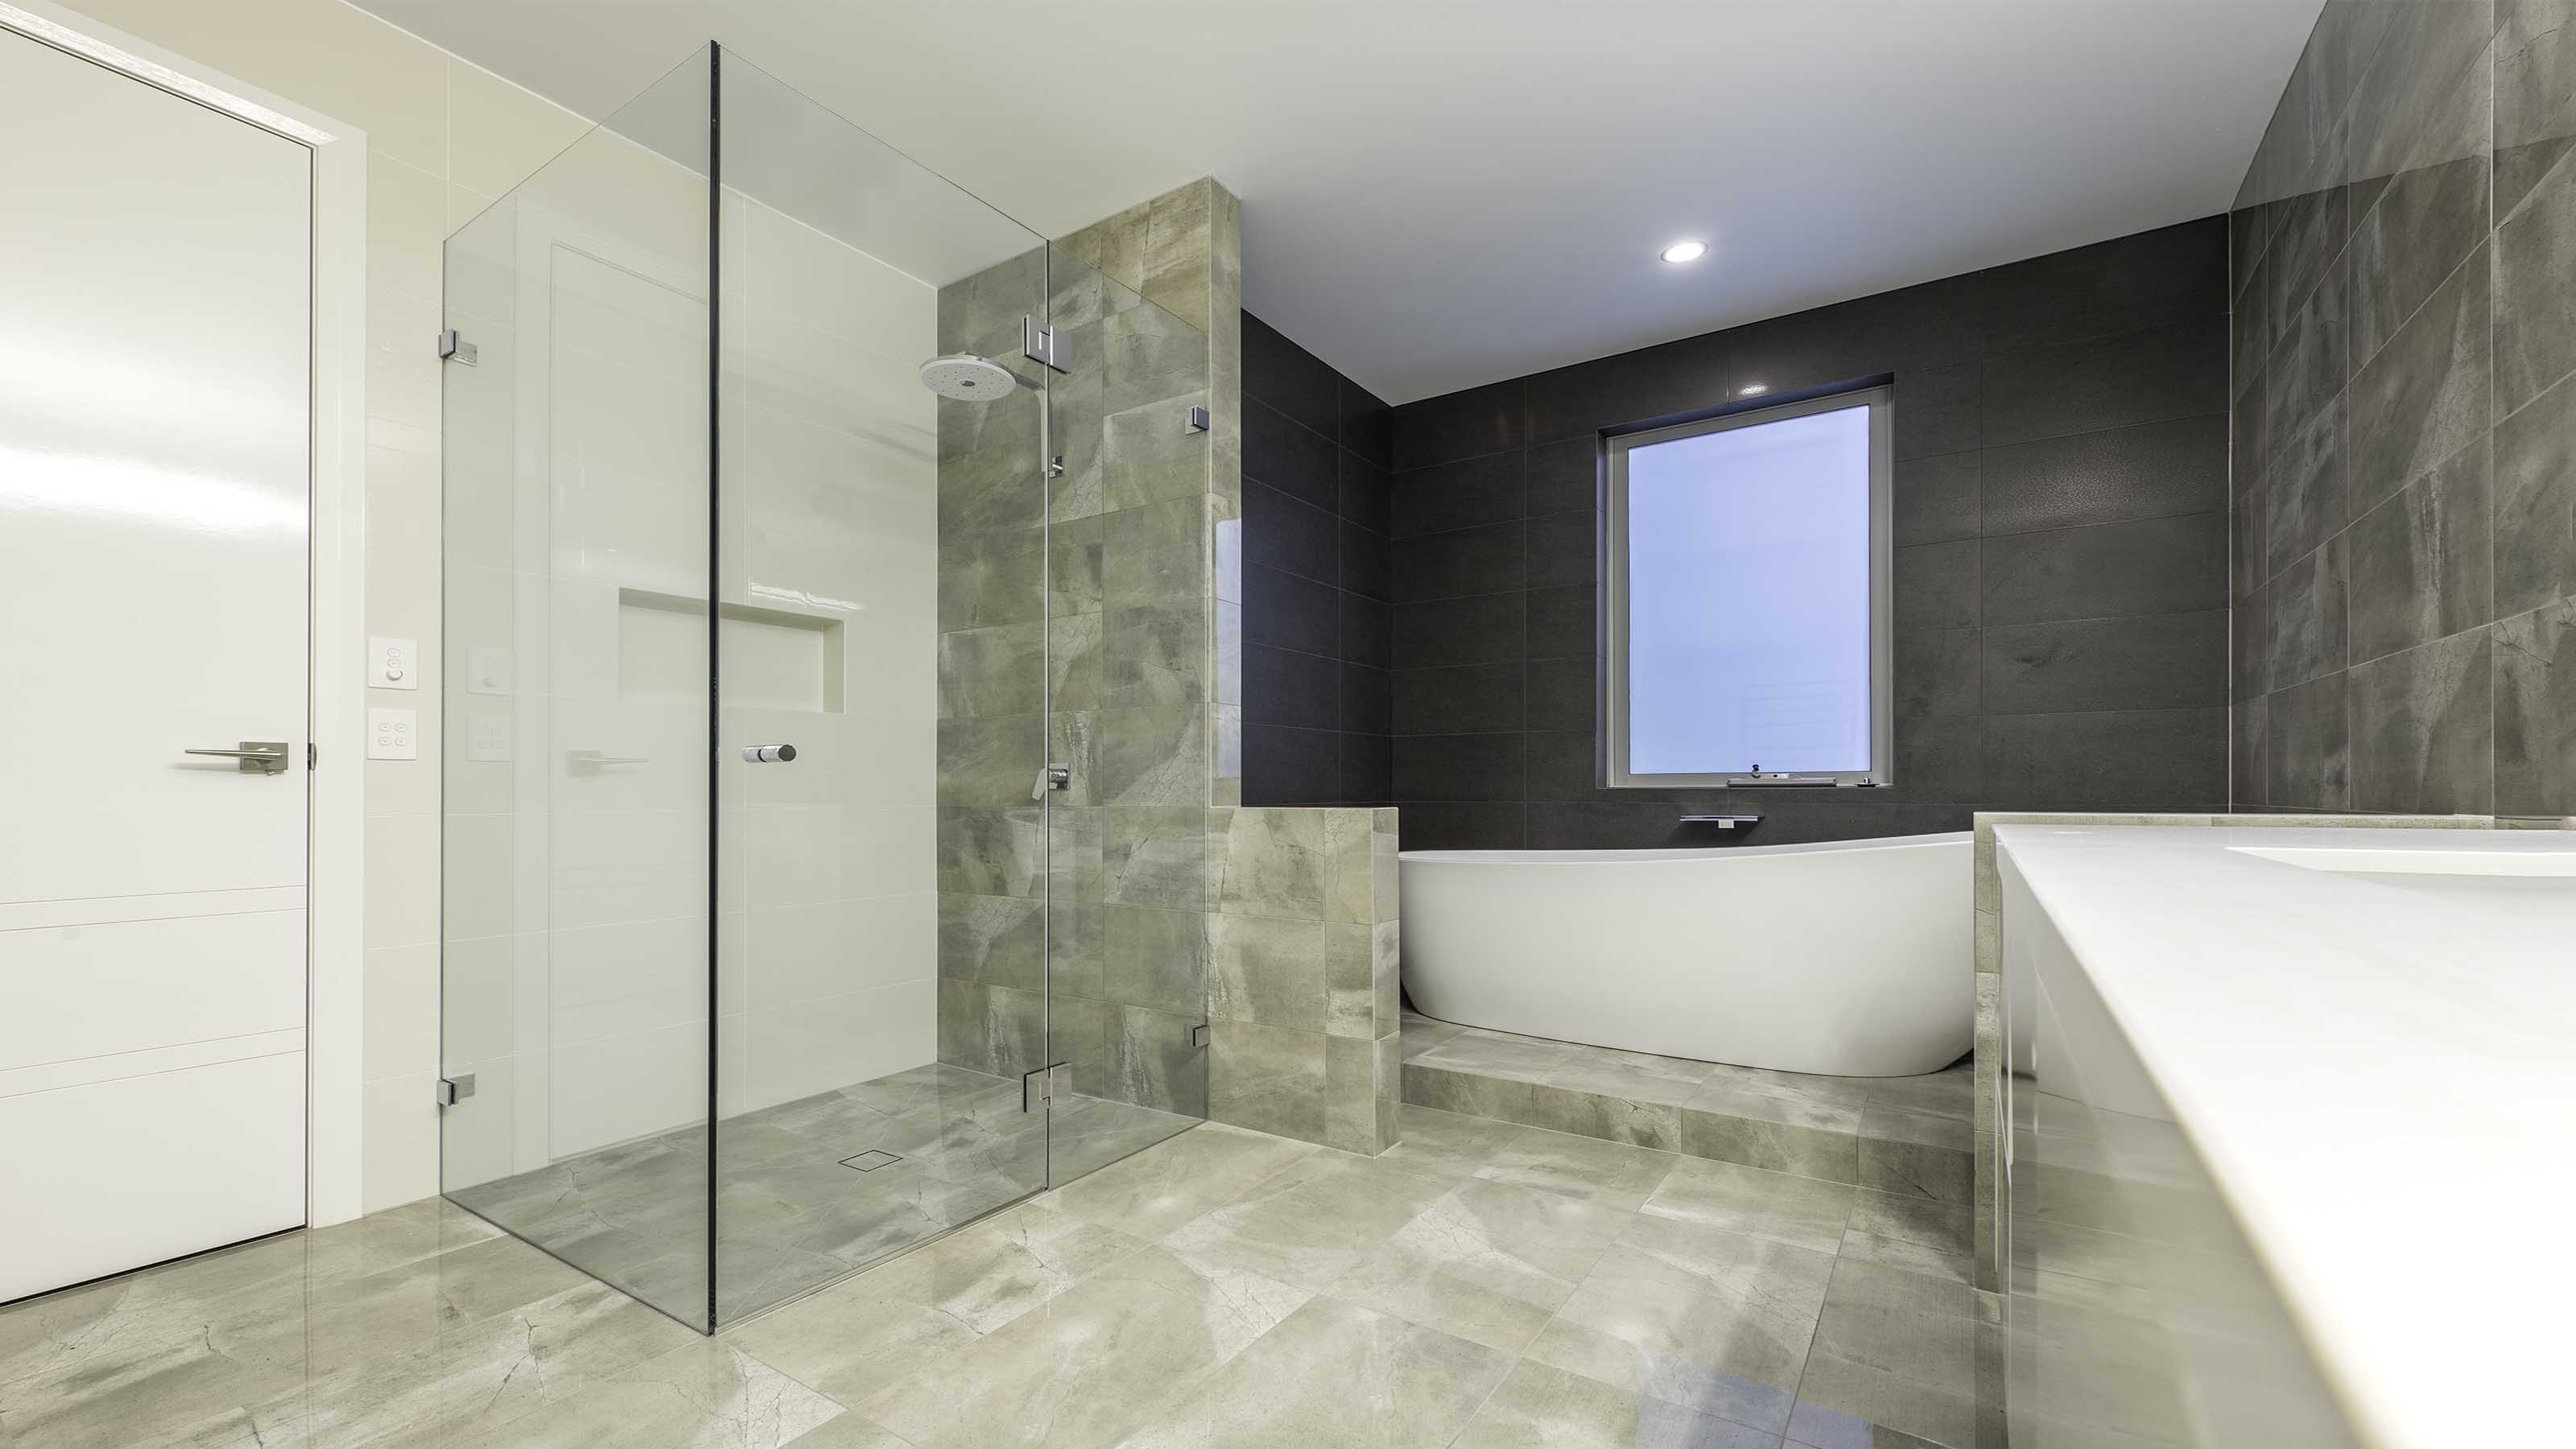 Bathroom Renovation Geelong images | photos | gallery | shower screens |geelong splashbacks